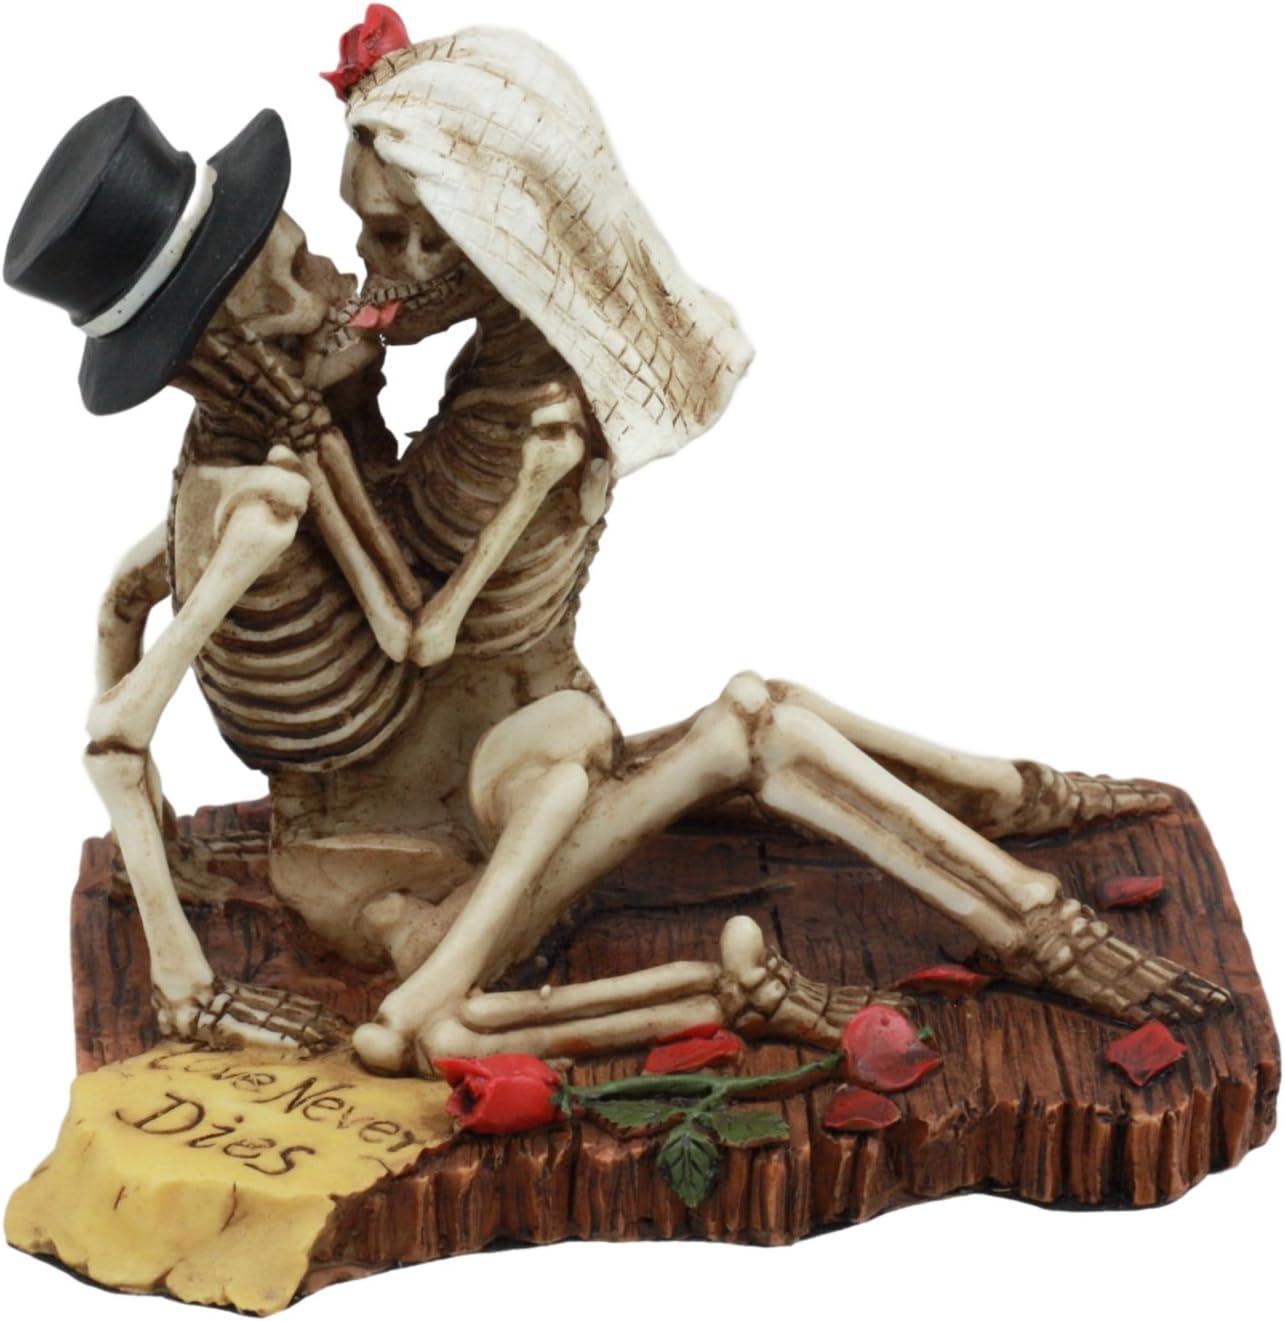 Gifts & Decors Wedding Skulls Love Never Dies Stranded CAST Away Skeletons Figurine